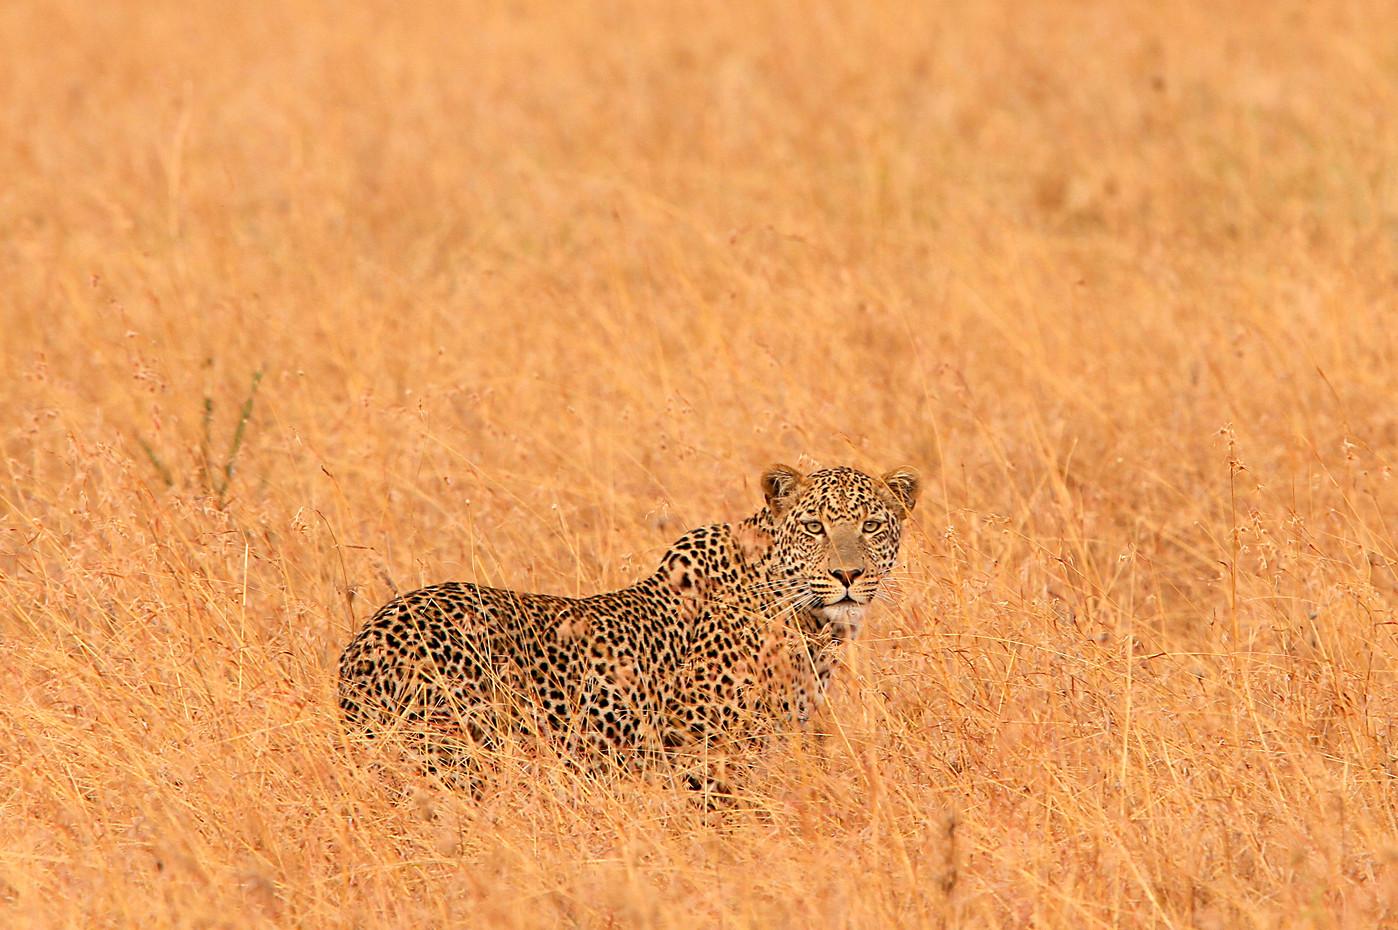 Leopard in the Serengeti NP, Tanzania